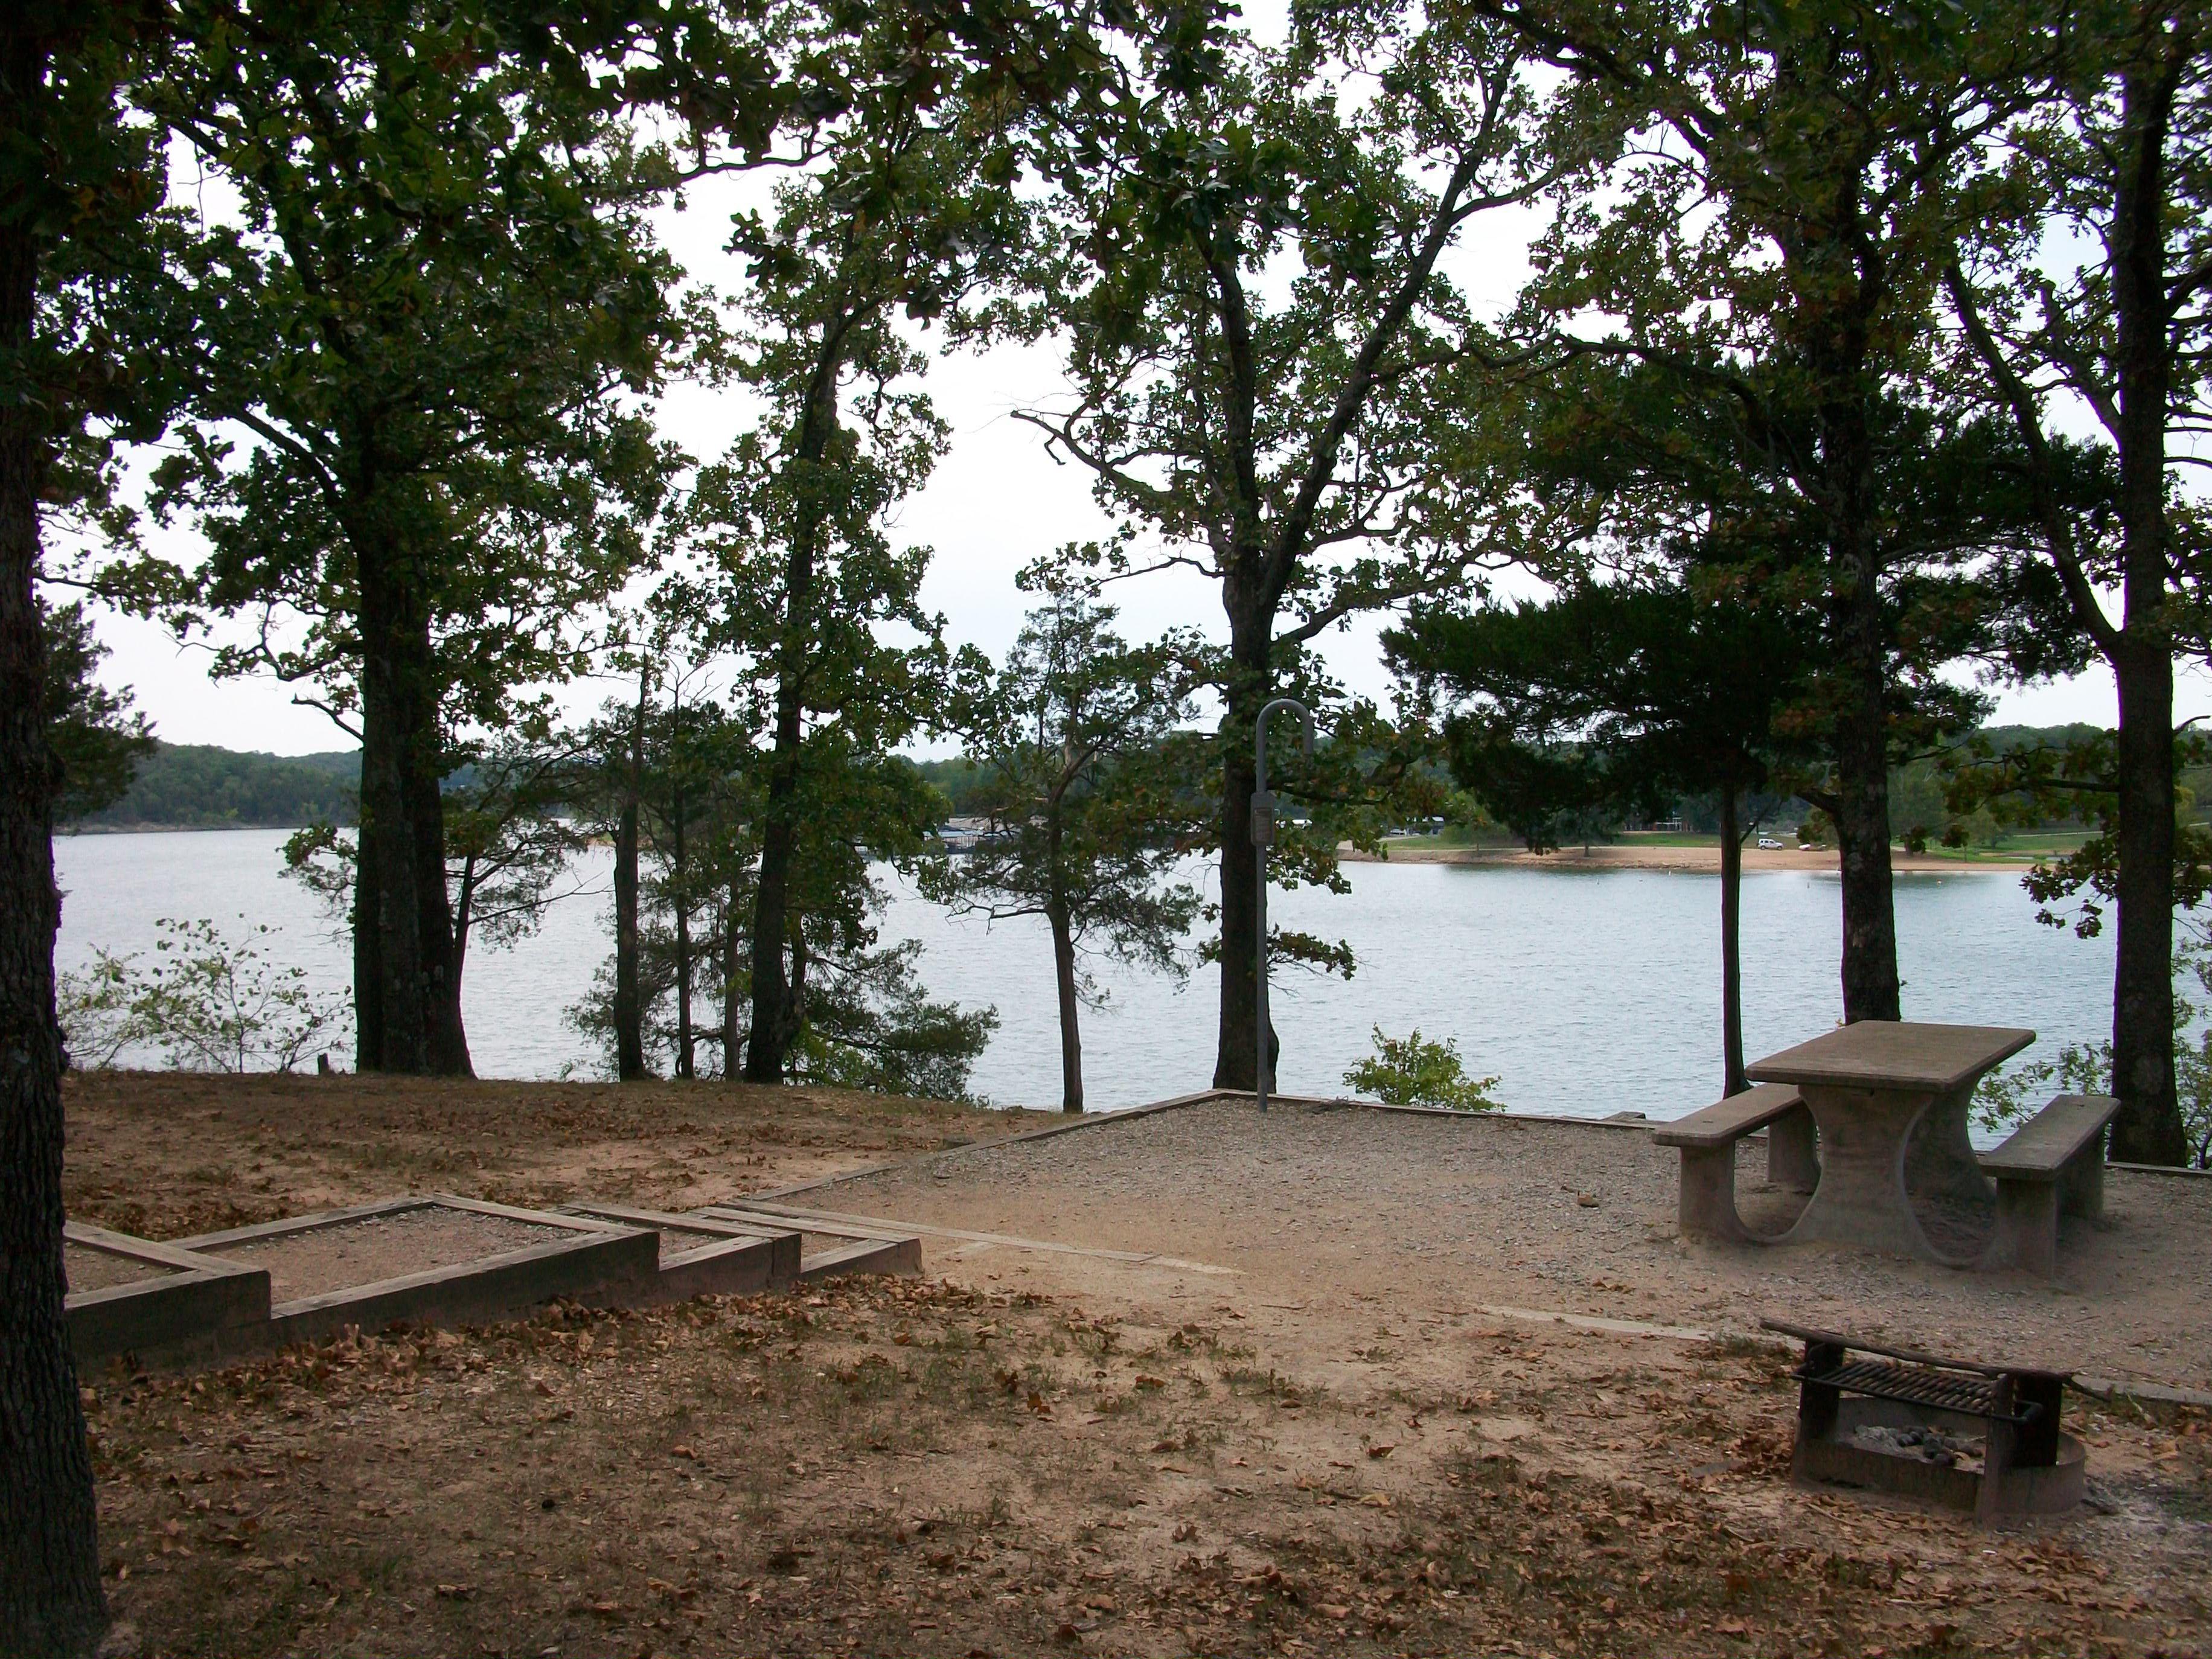 camping at viney creek park on table rock lake mo missouri rh pinterest com au table rock state park mo forum table rock state park mo campground map